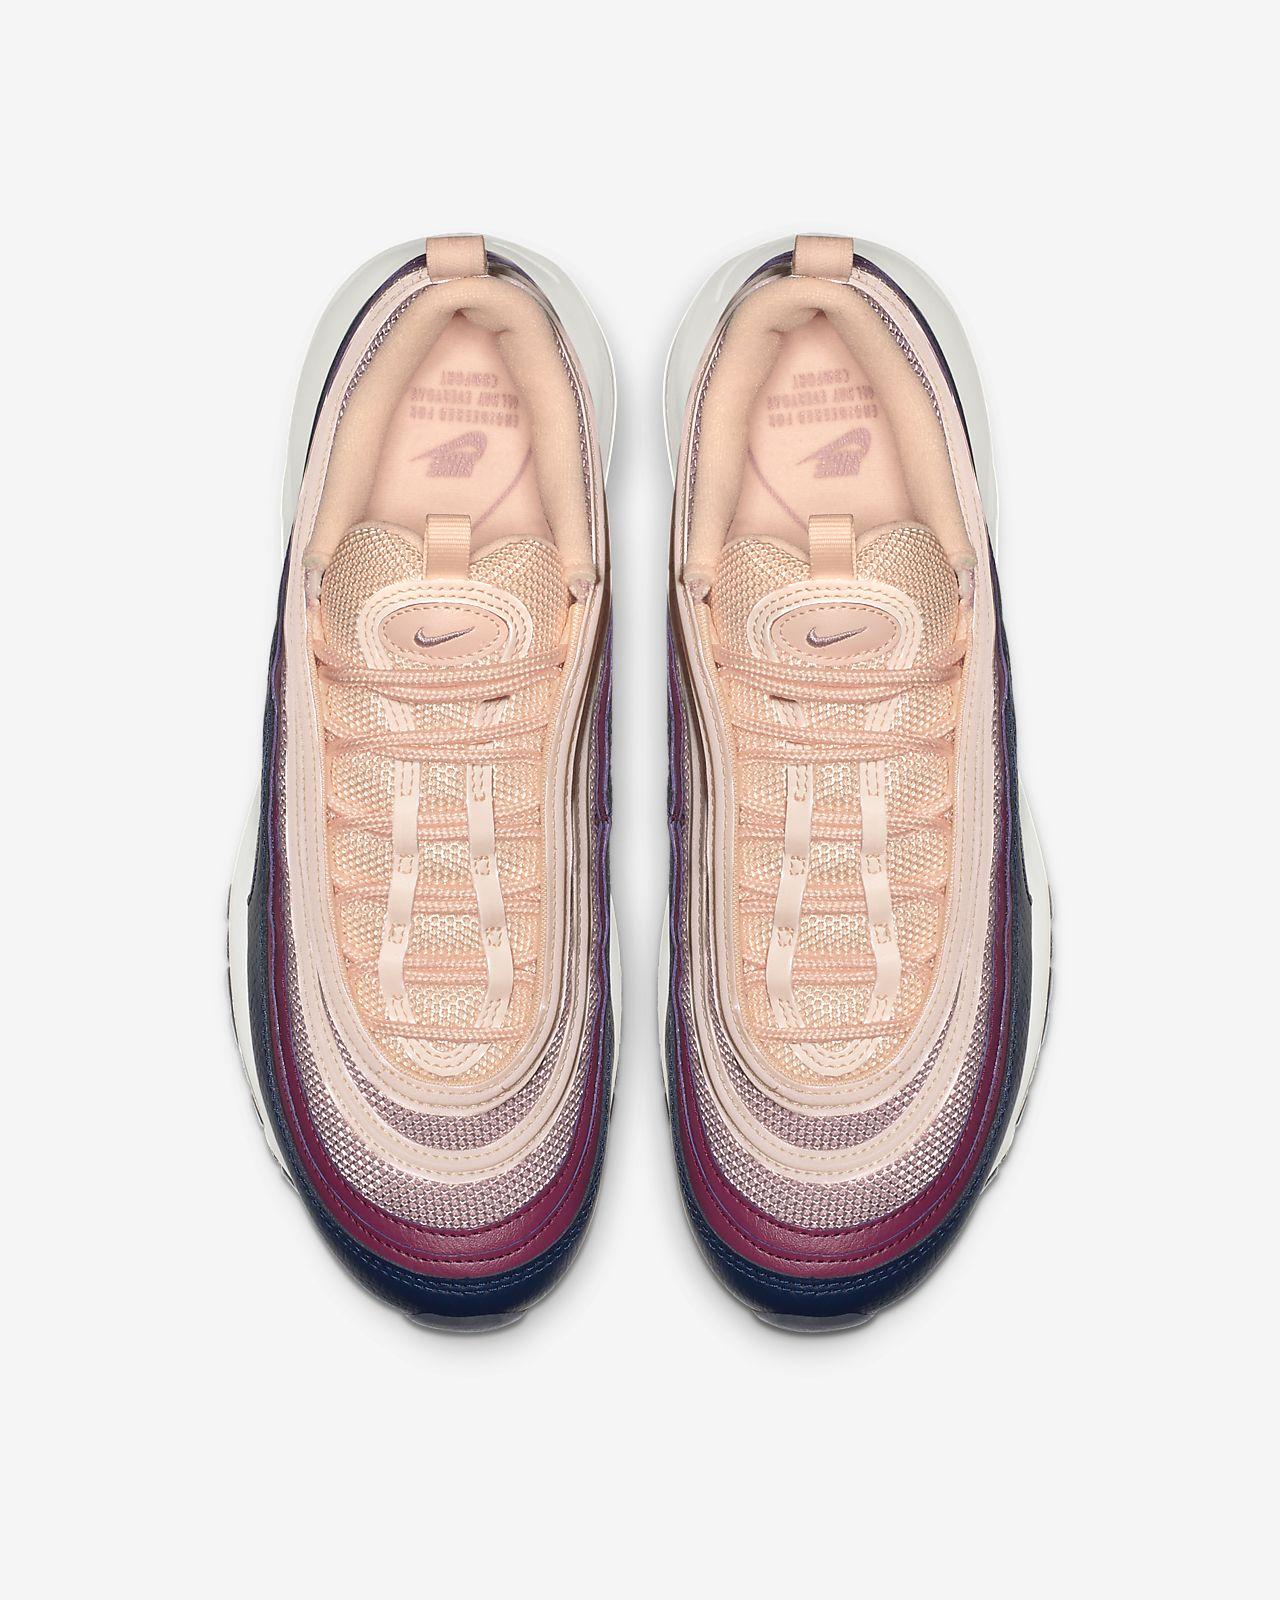 official photos df0eb e8782 ... Nike Air Max 97 Women s Shoe